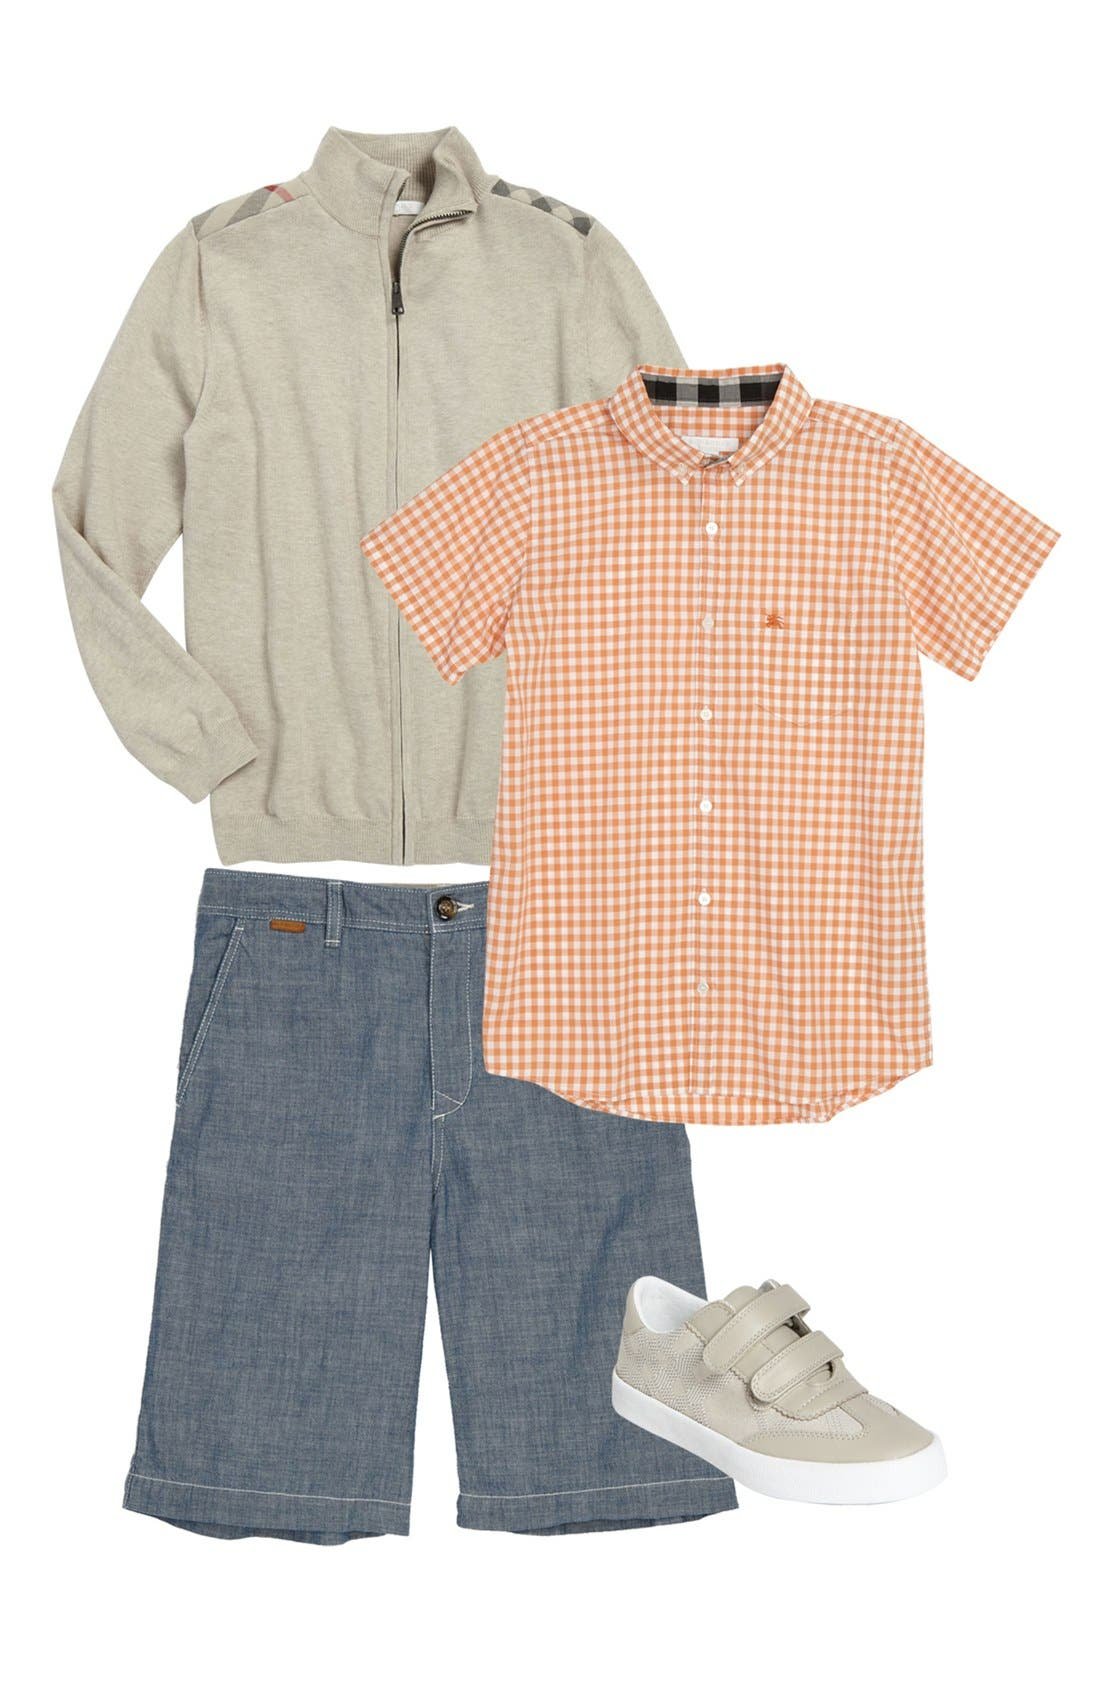 Main Image - Burberry Woven Shirt, Sweater, Shorts & Sneaker (Little Boys & Big Boys)